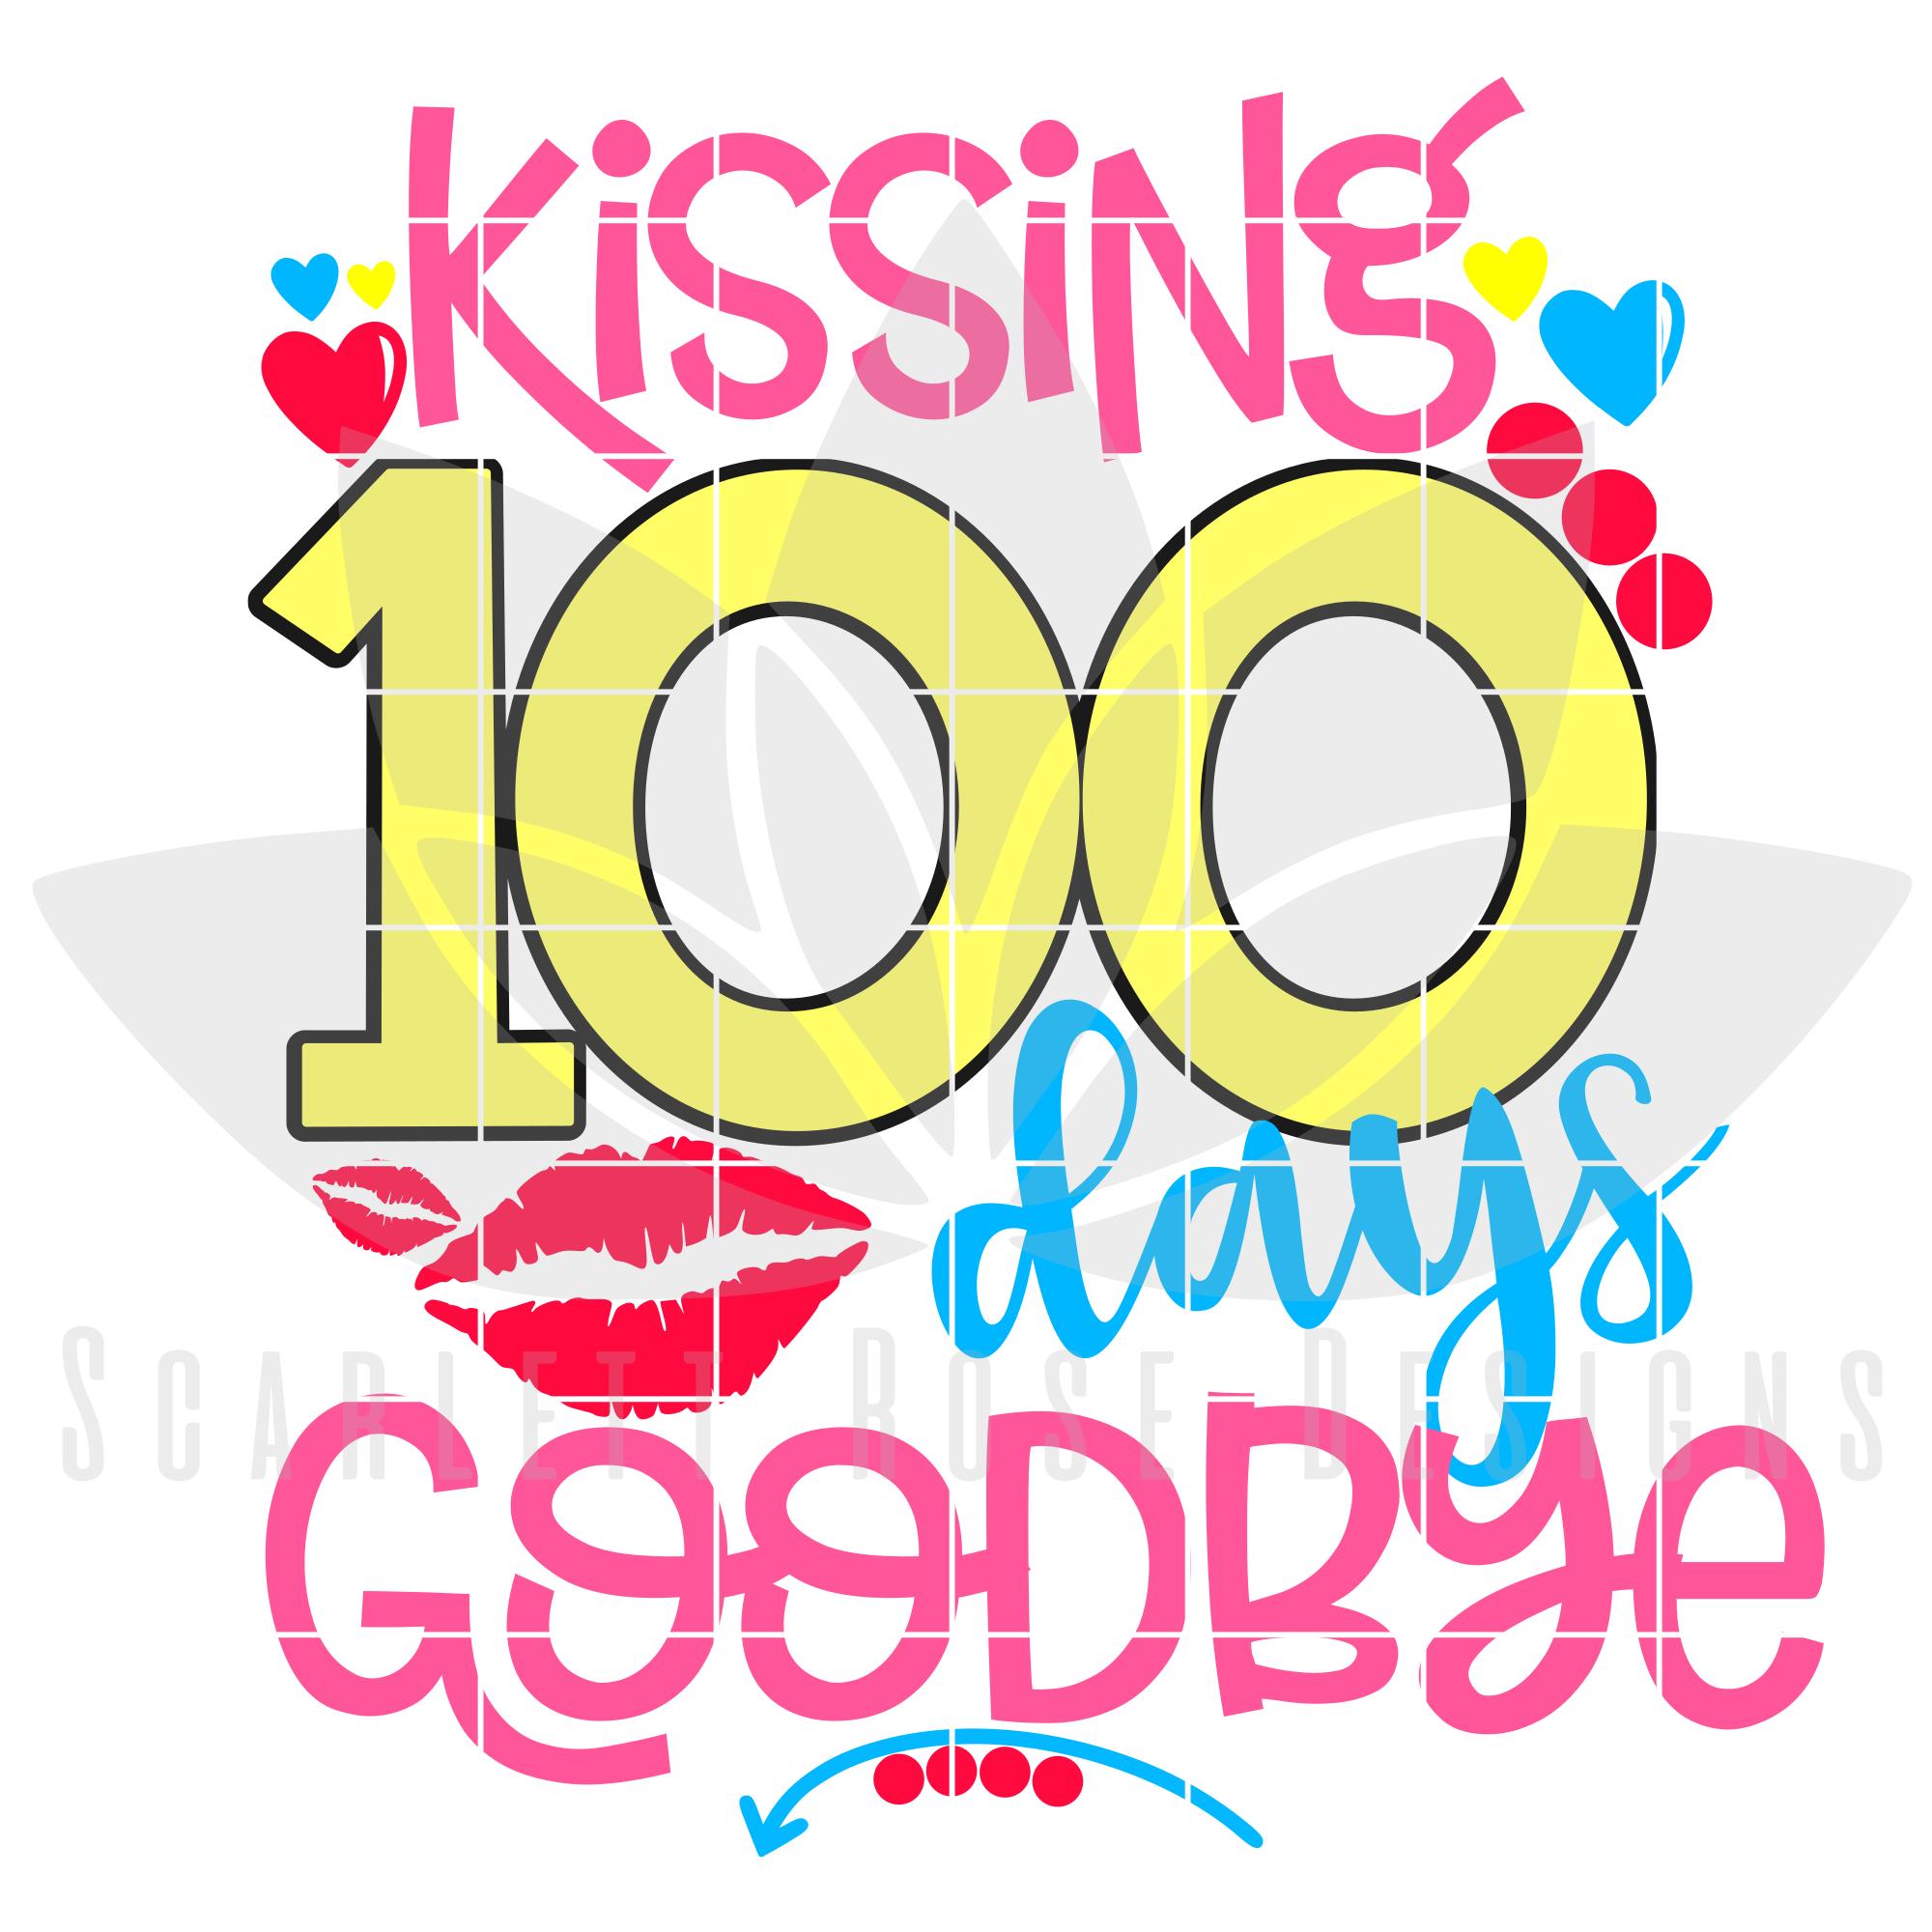 2000x2000 100th Day Of School Svg, Dxf Kissing 100 Days Goodbye